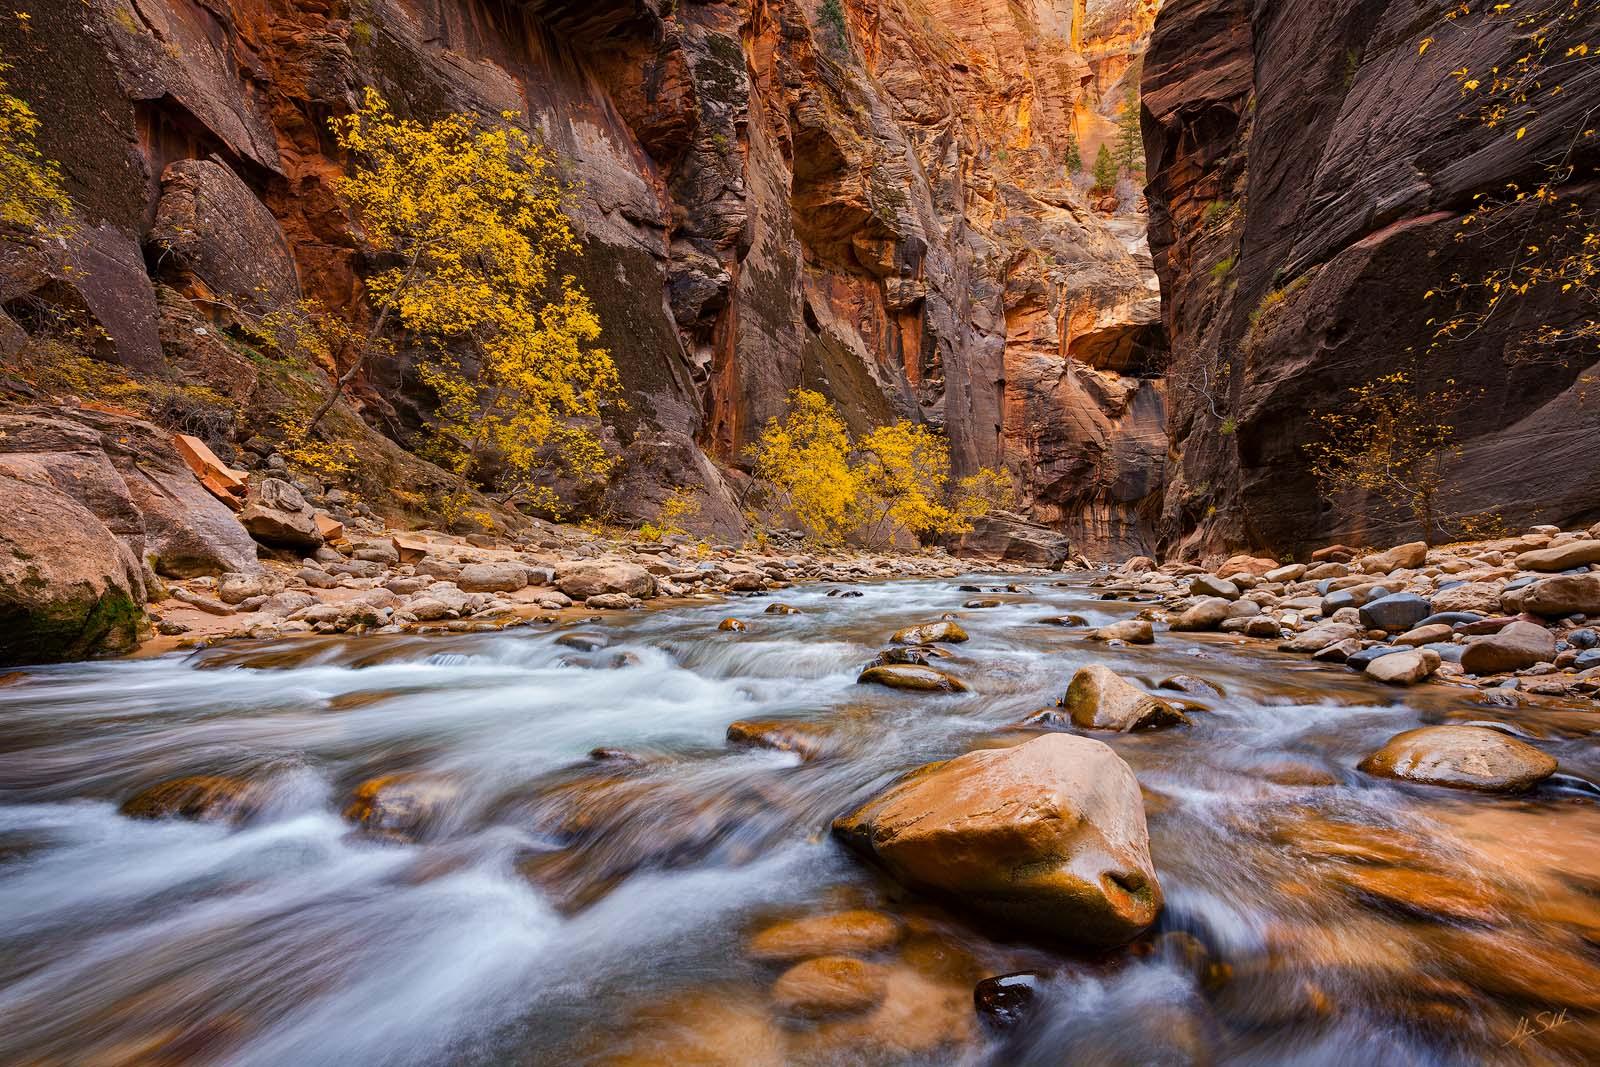 Grand Canyon, National Park, River, The Narrows, UT, Virgin River, Water, Zion, narrows, photo